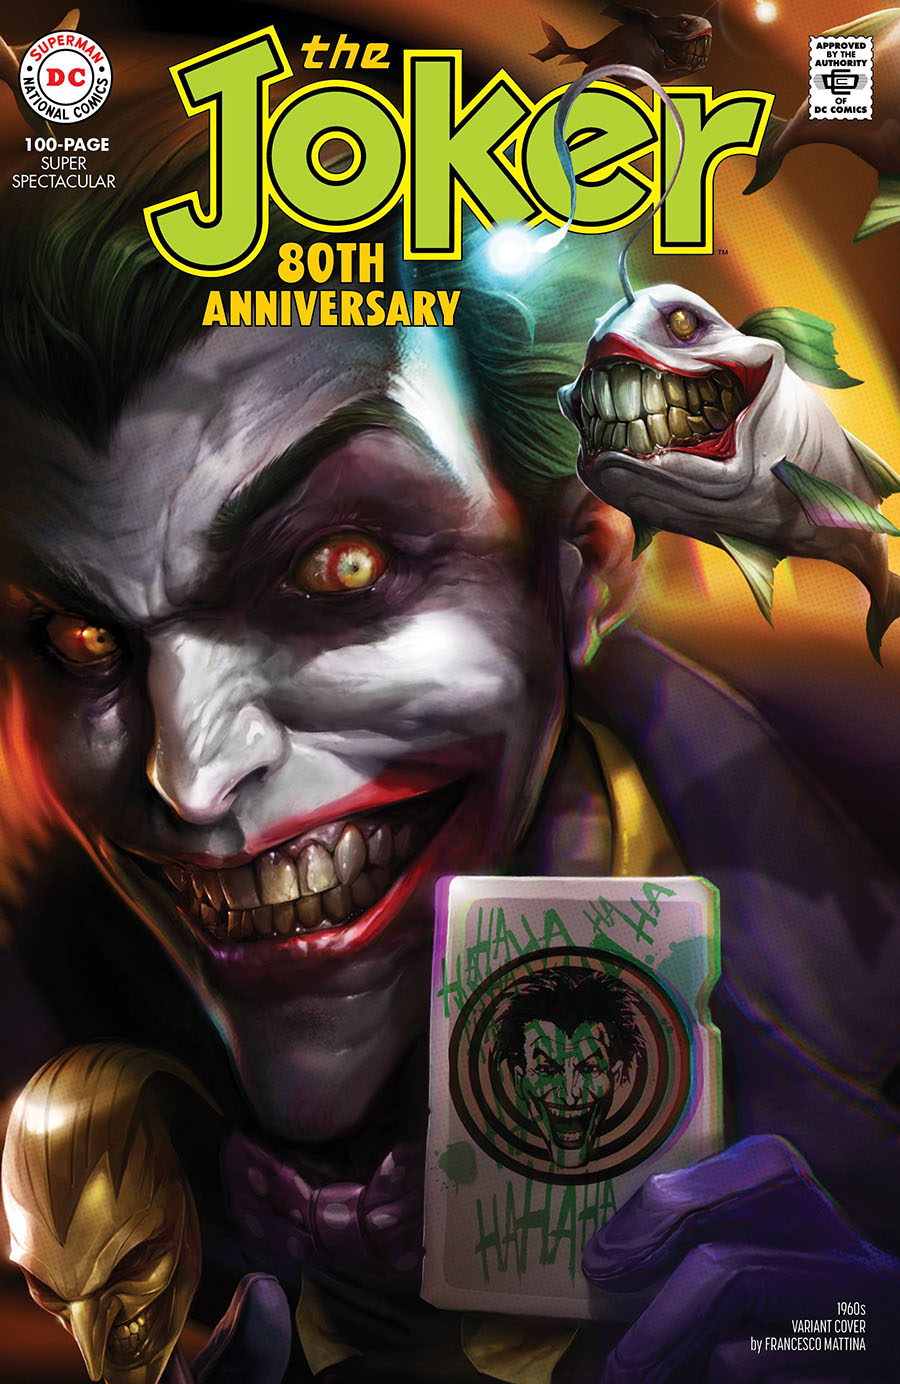 Joker 80th Anniversary 100-Page Super Spectacular #1 Cover D Variant Francesco Mattina 1960s Cover